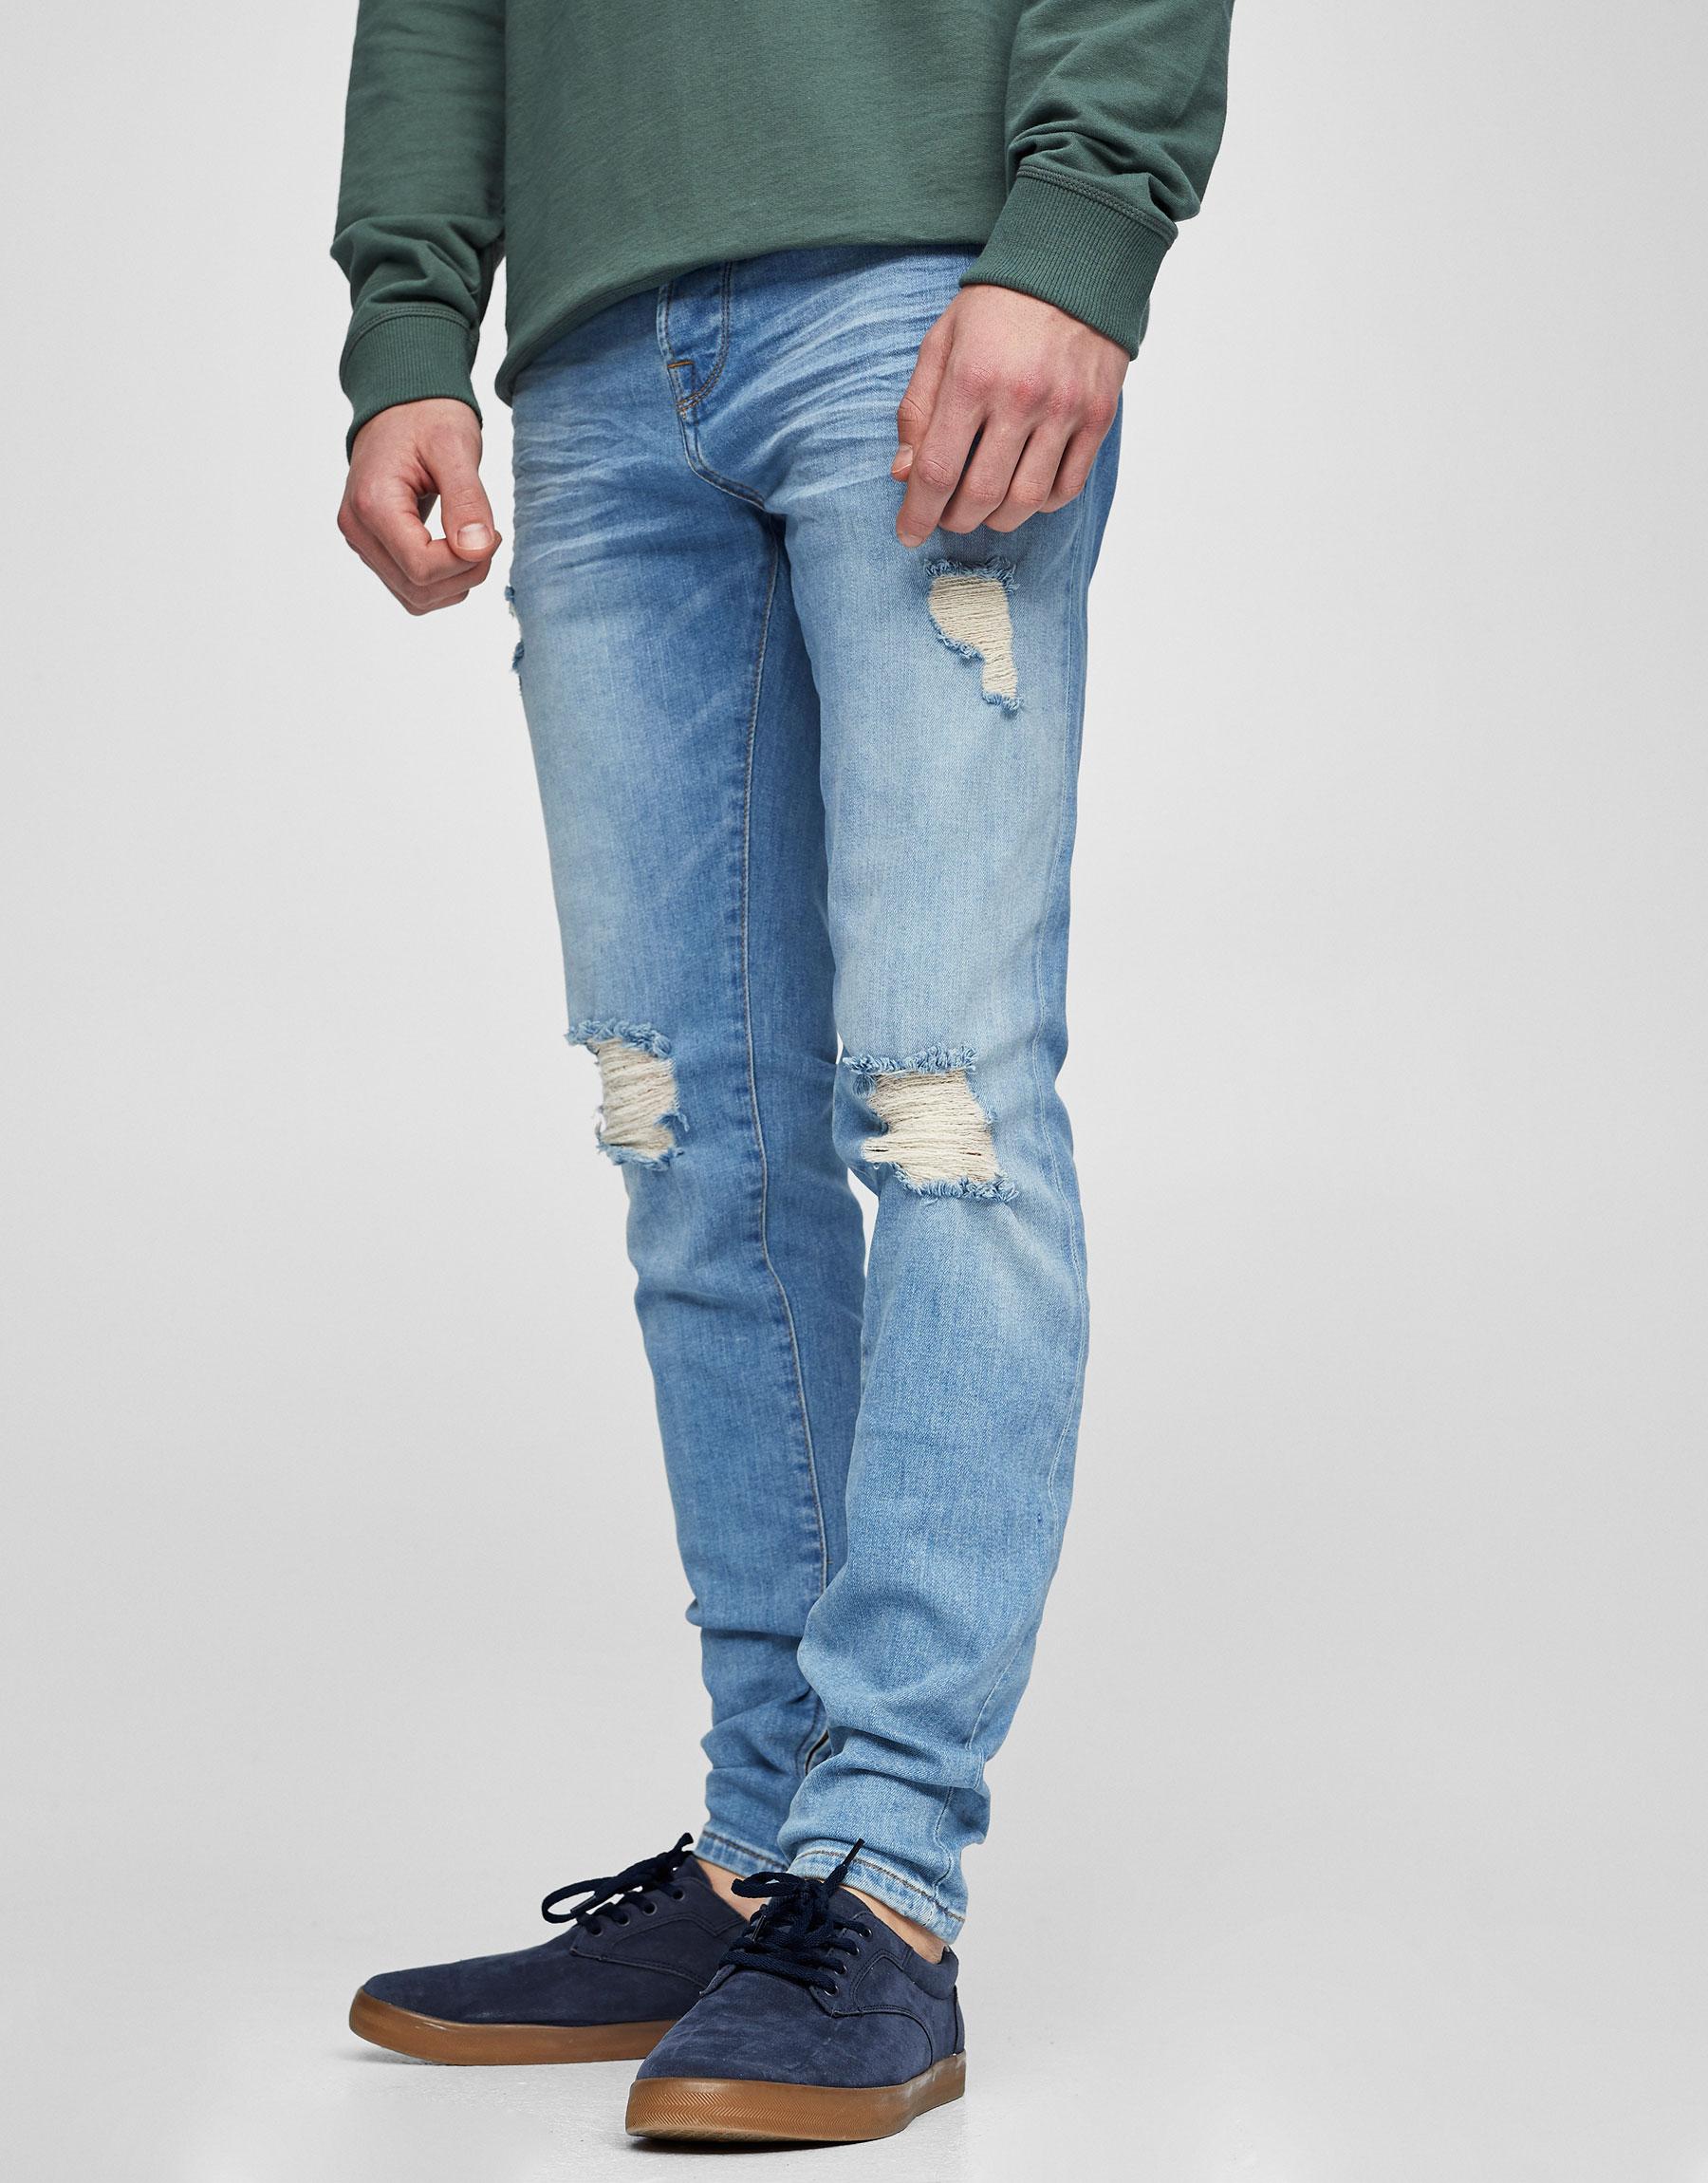 Jeans skinny fit rotos azul claro